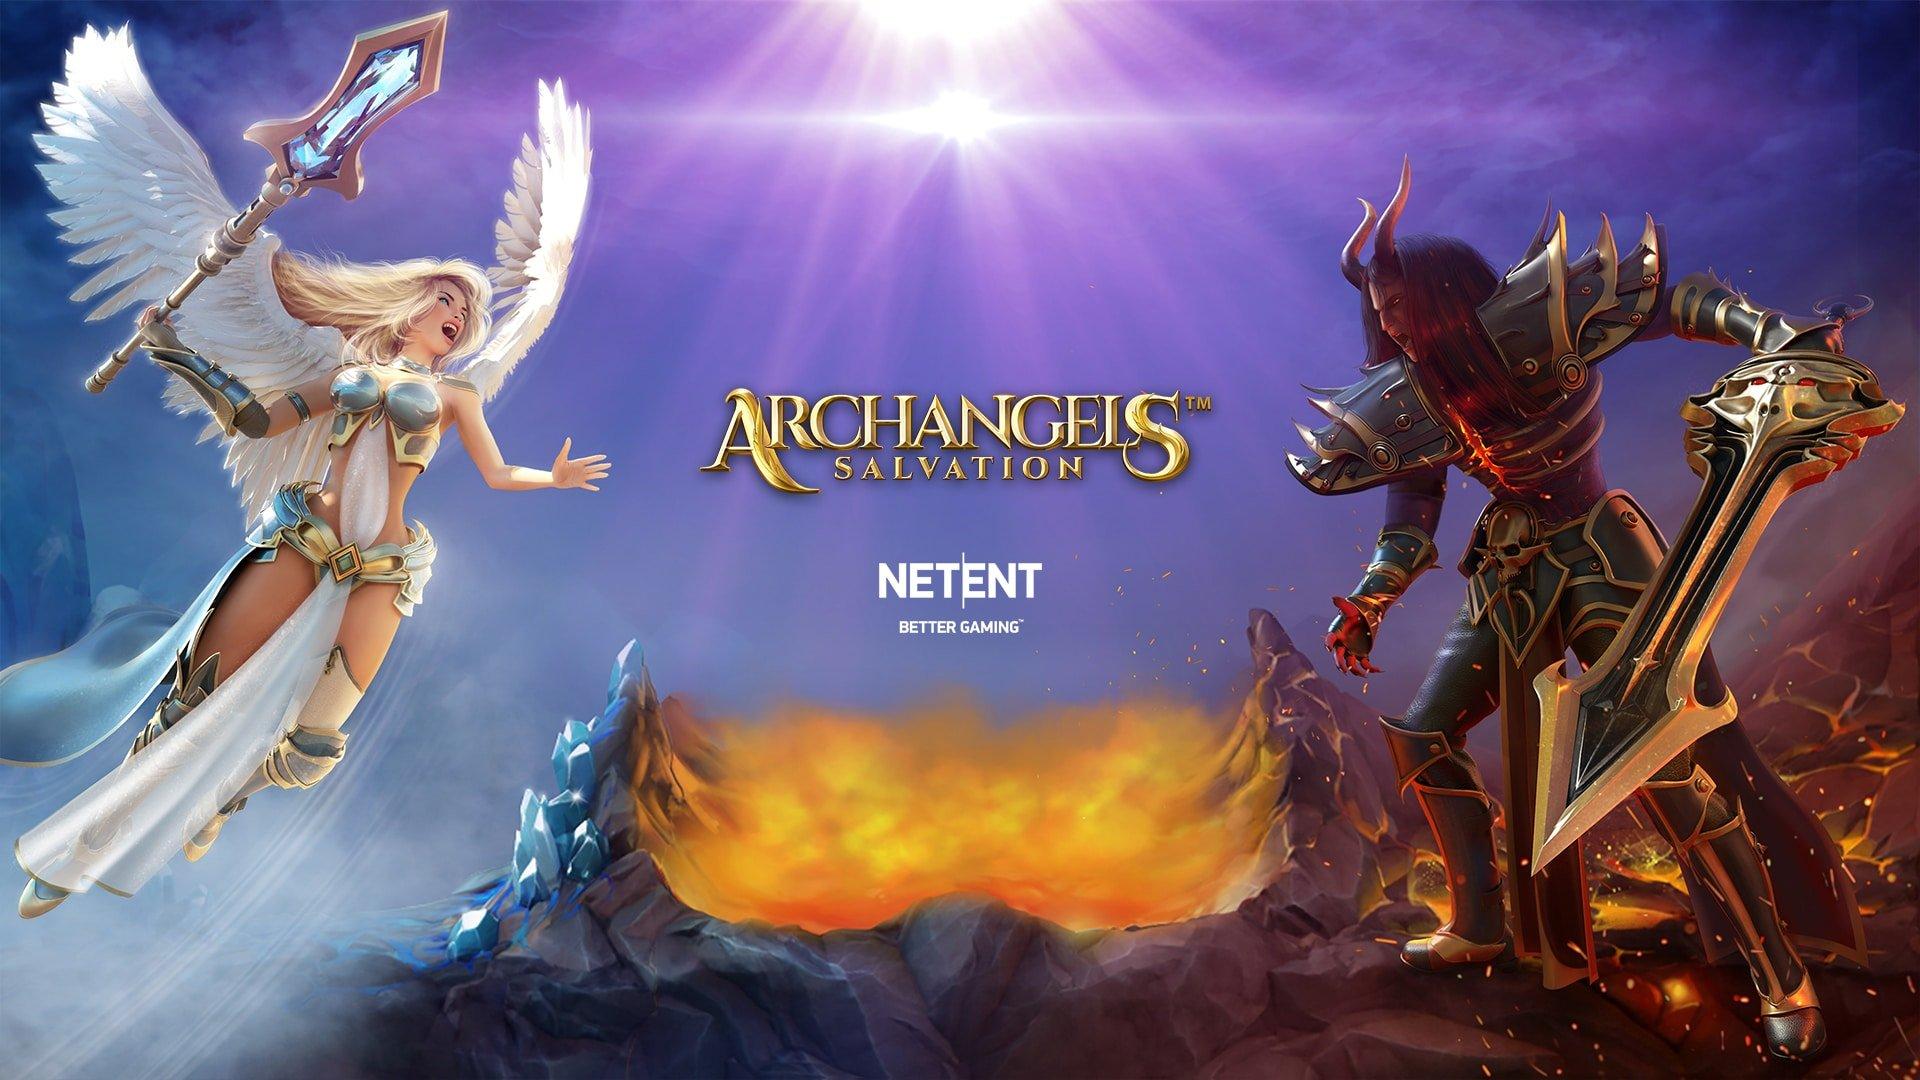 Archangels: Salvation, NetEnt